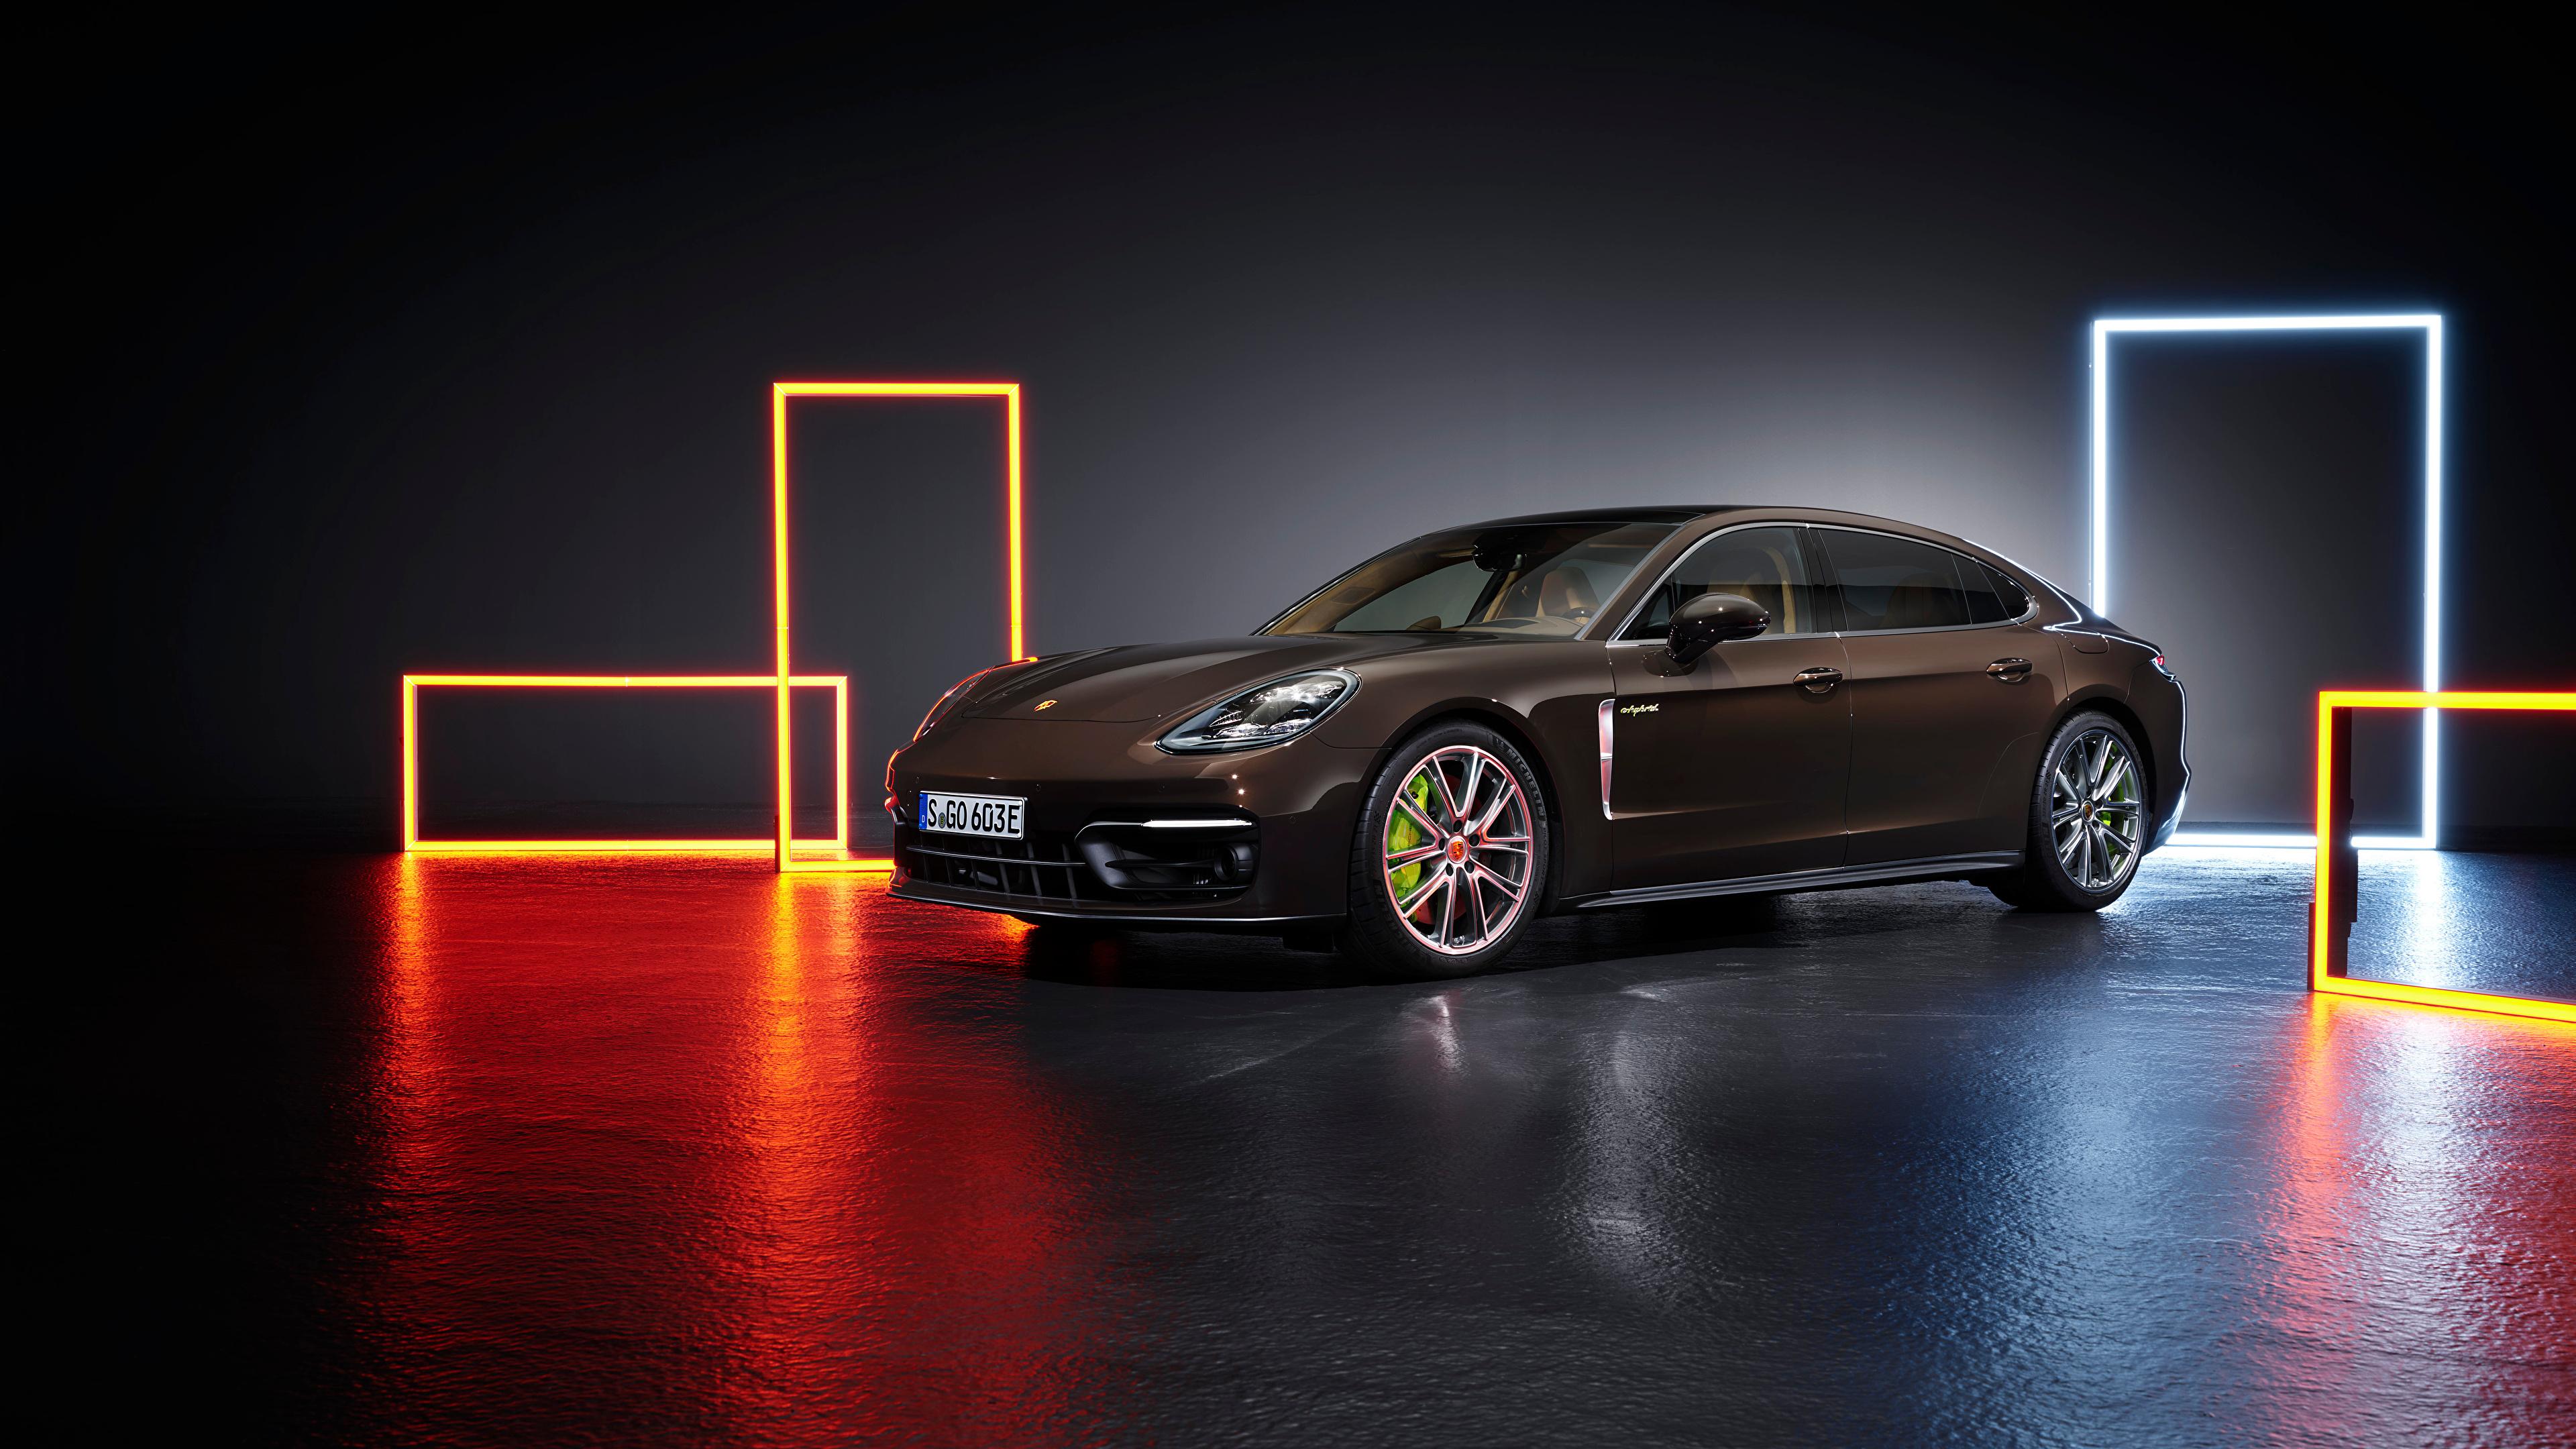 Фото Порше anamera 4S E-Hybrid Executive, (971), 2020 коричневые Сбоку Металлик Автомобили 3840x2160 Porsche Коричневый коричневая авто машины машина автомобиль